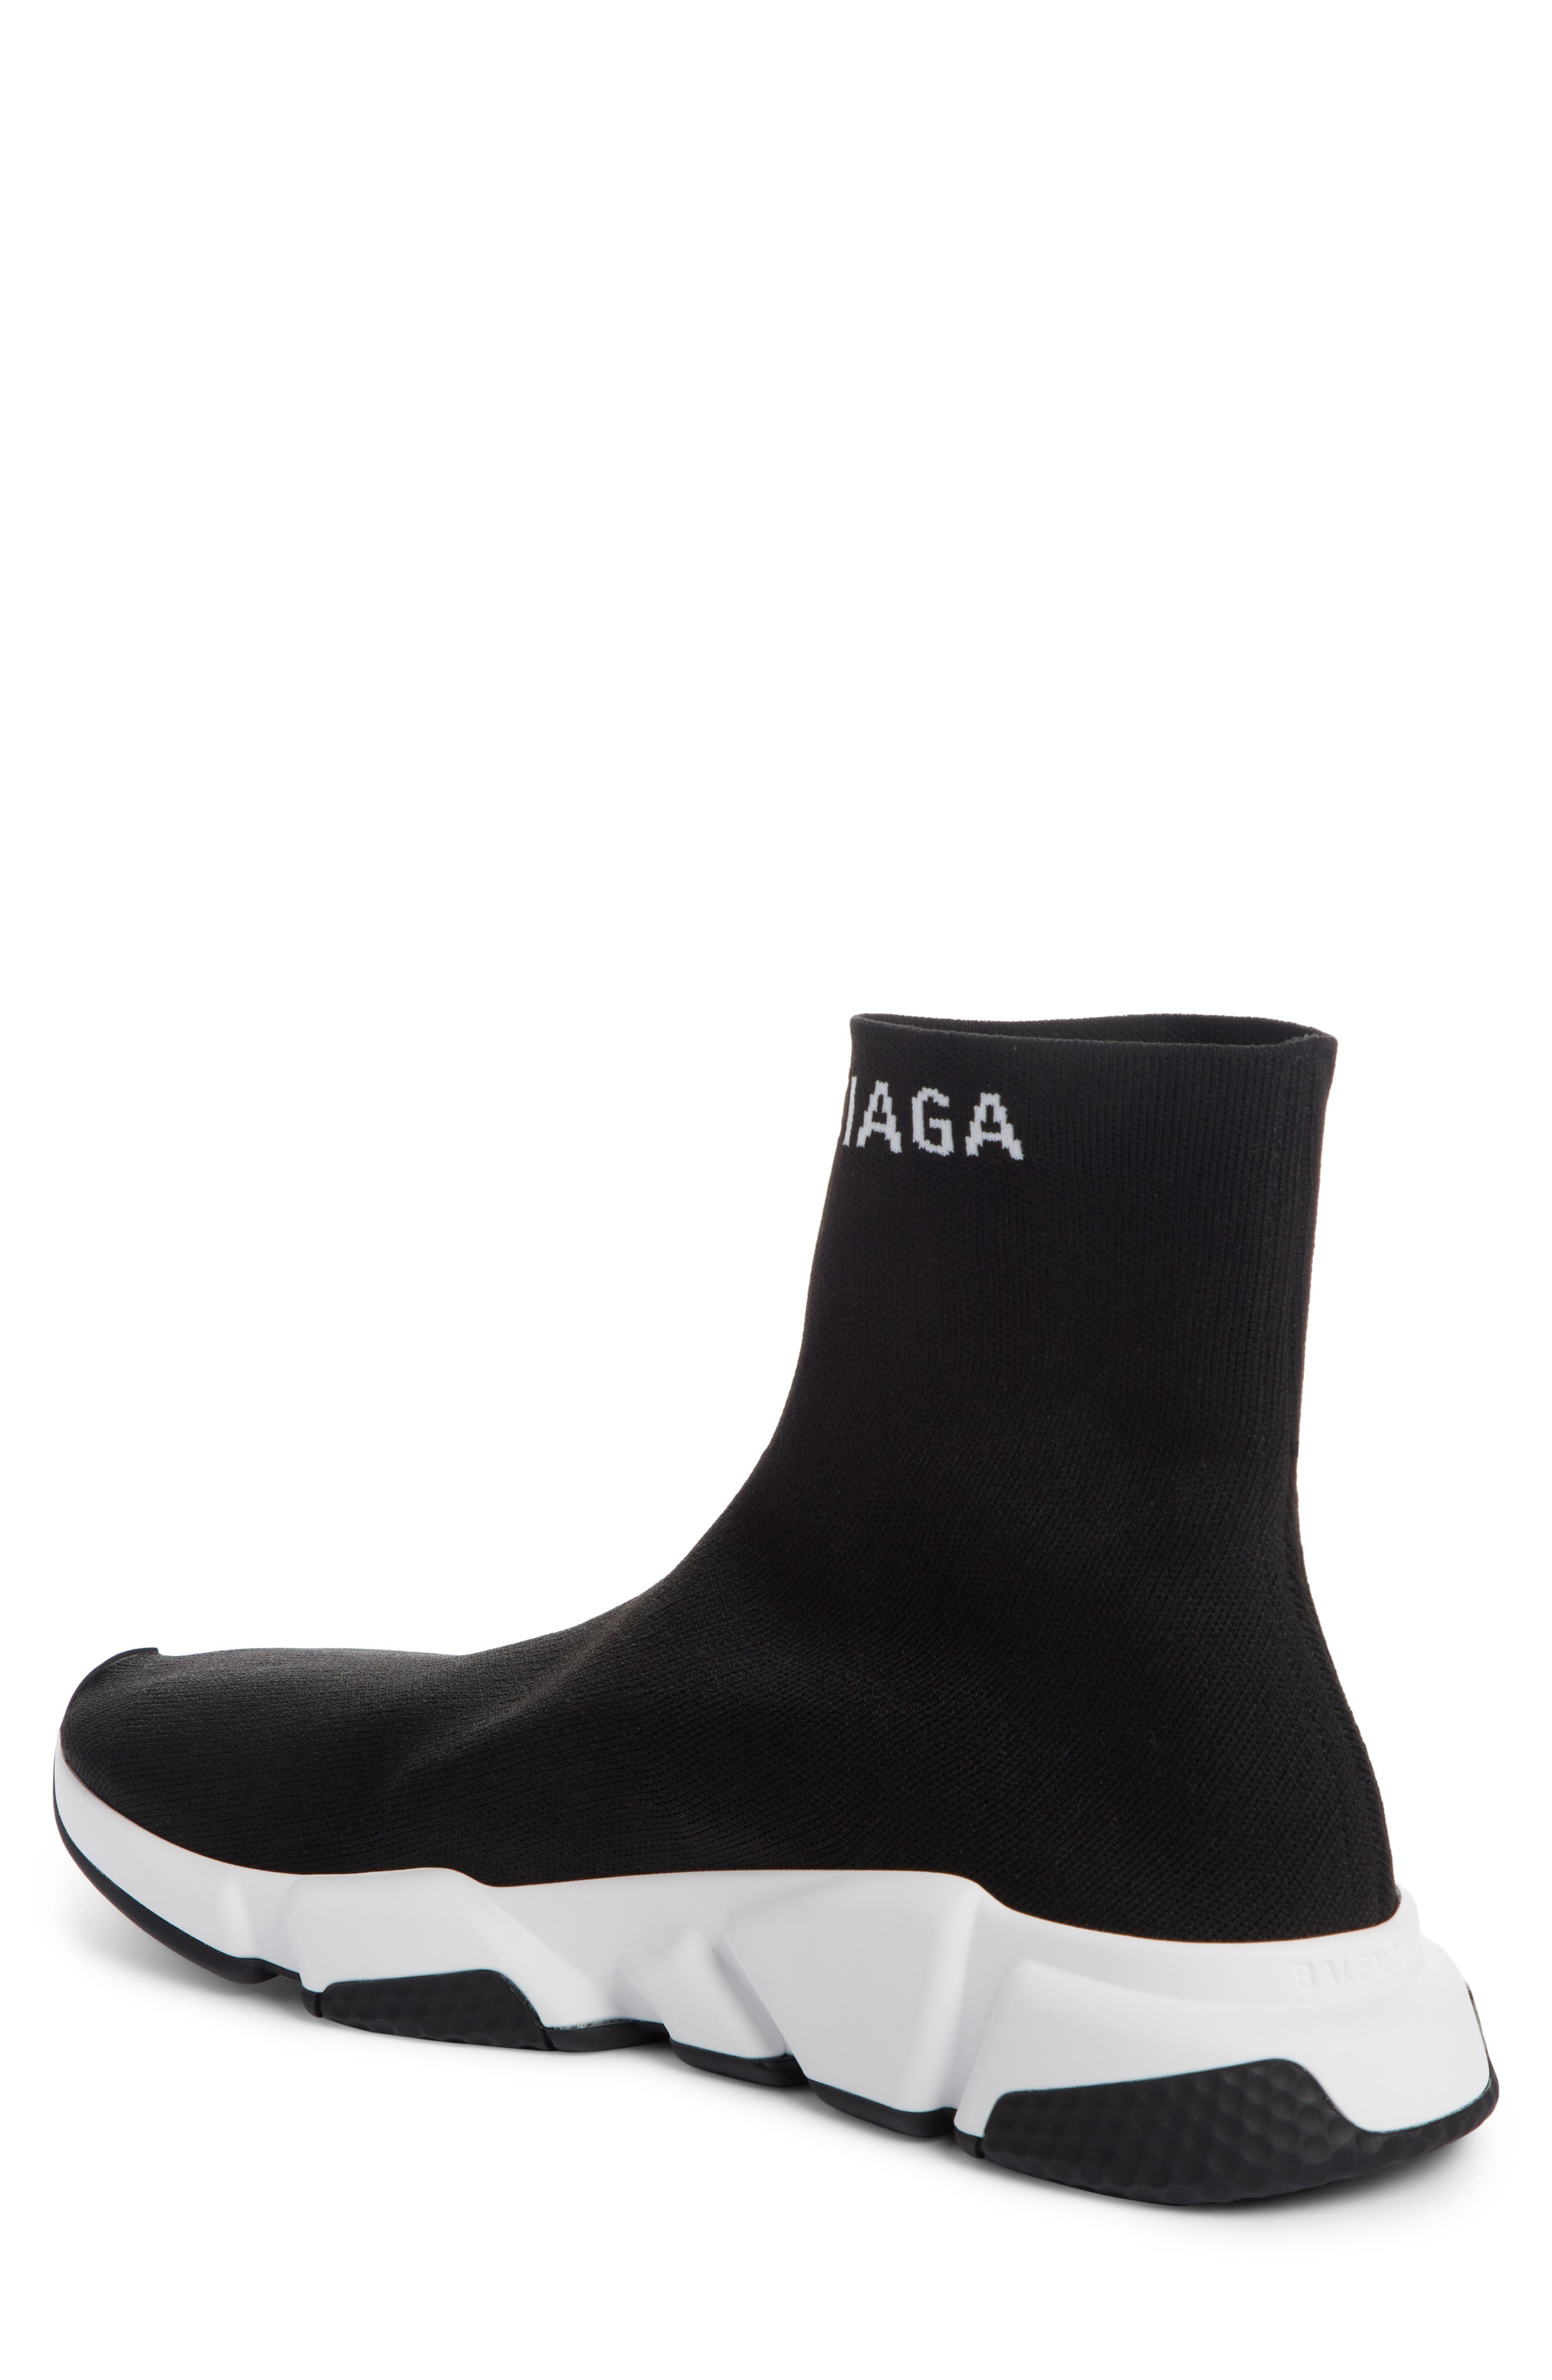 BALENCIAGA, Speed Sock Slip-On, Alternate thumbnail 2, color, BLACK/ WHITE